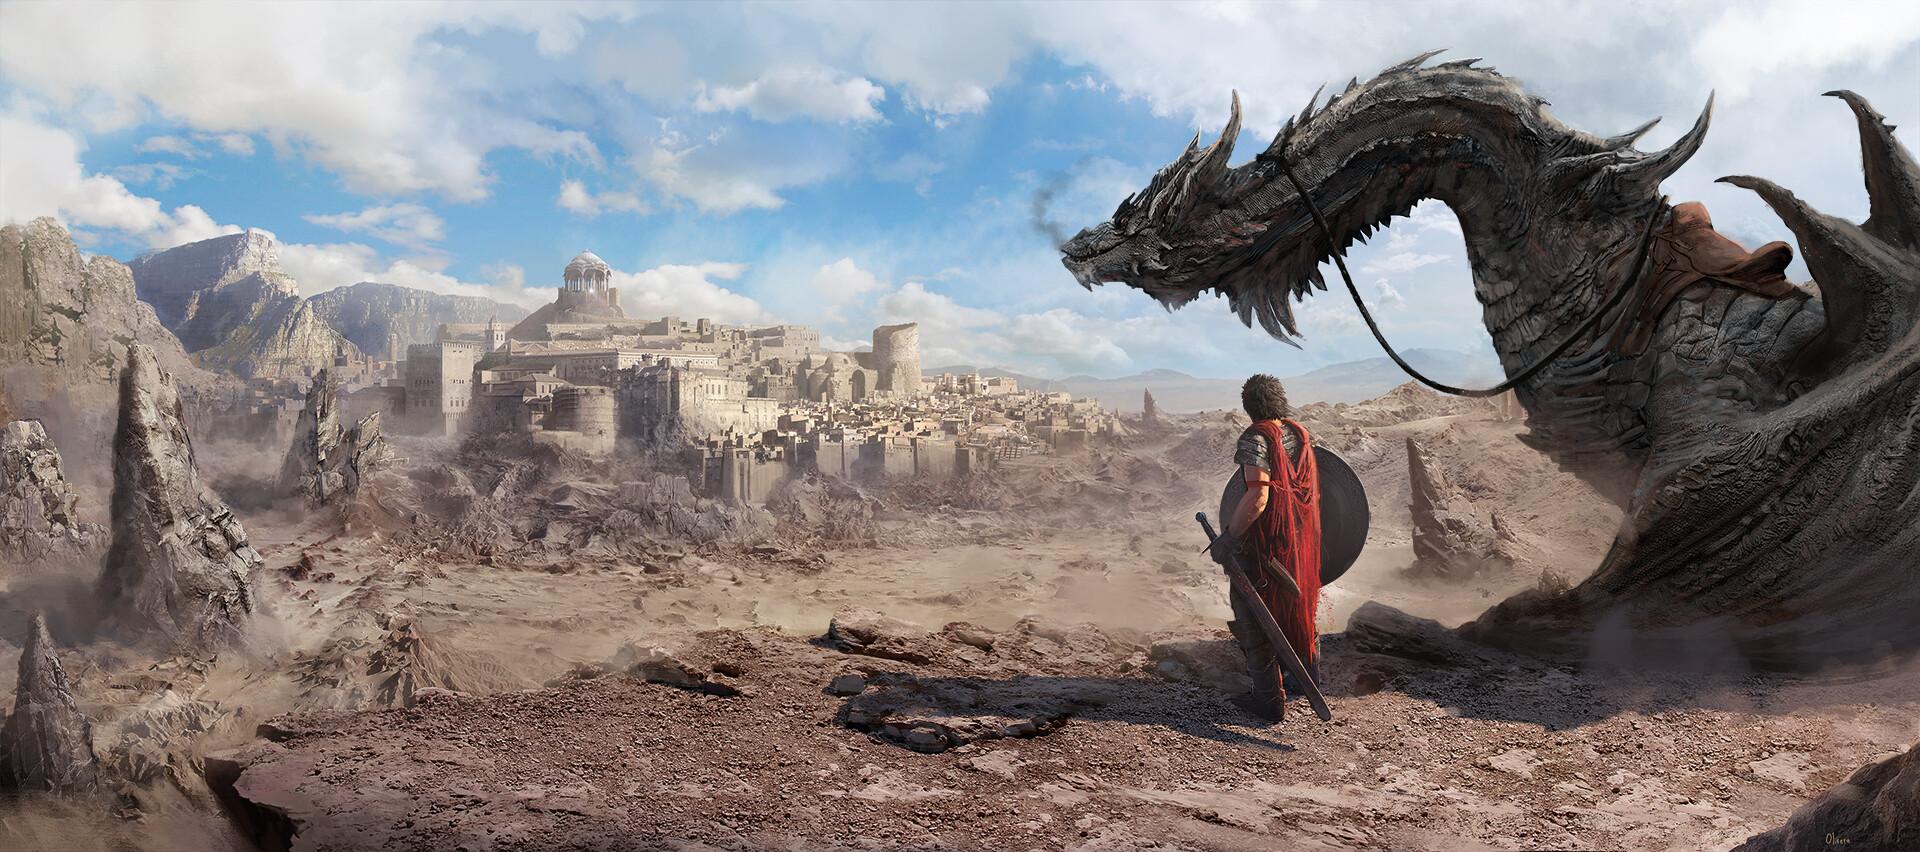 Pablo olivera dragon nippur print